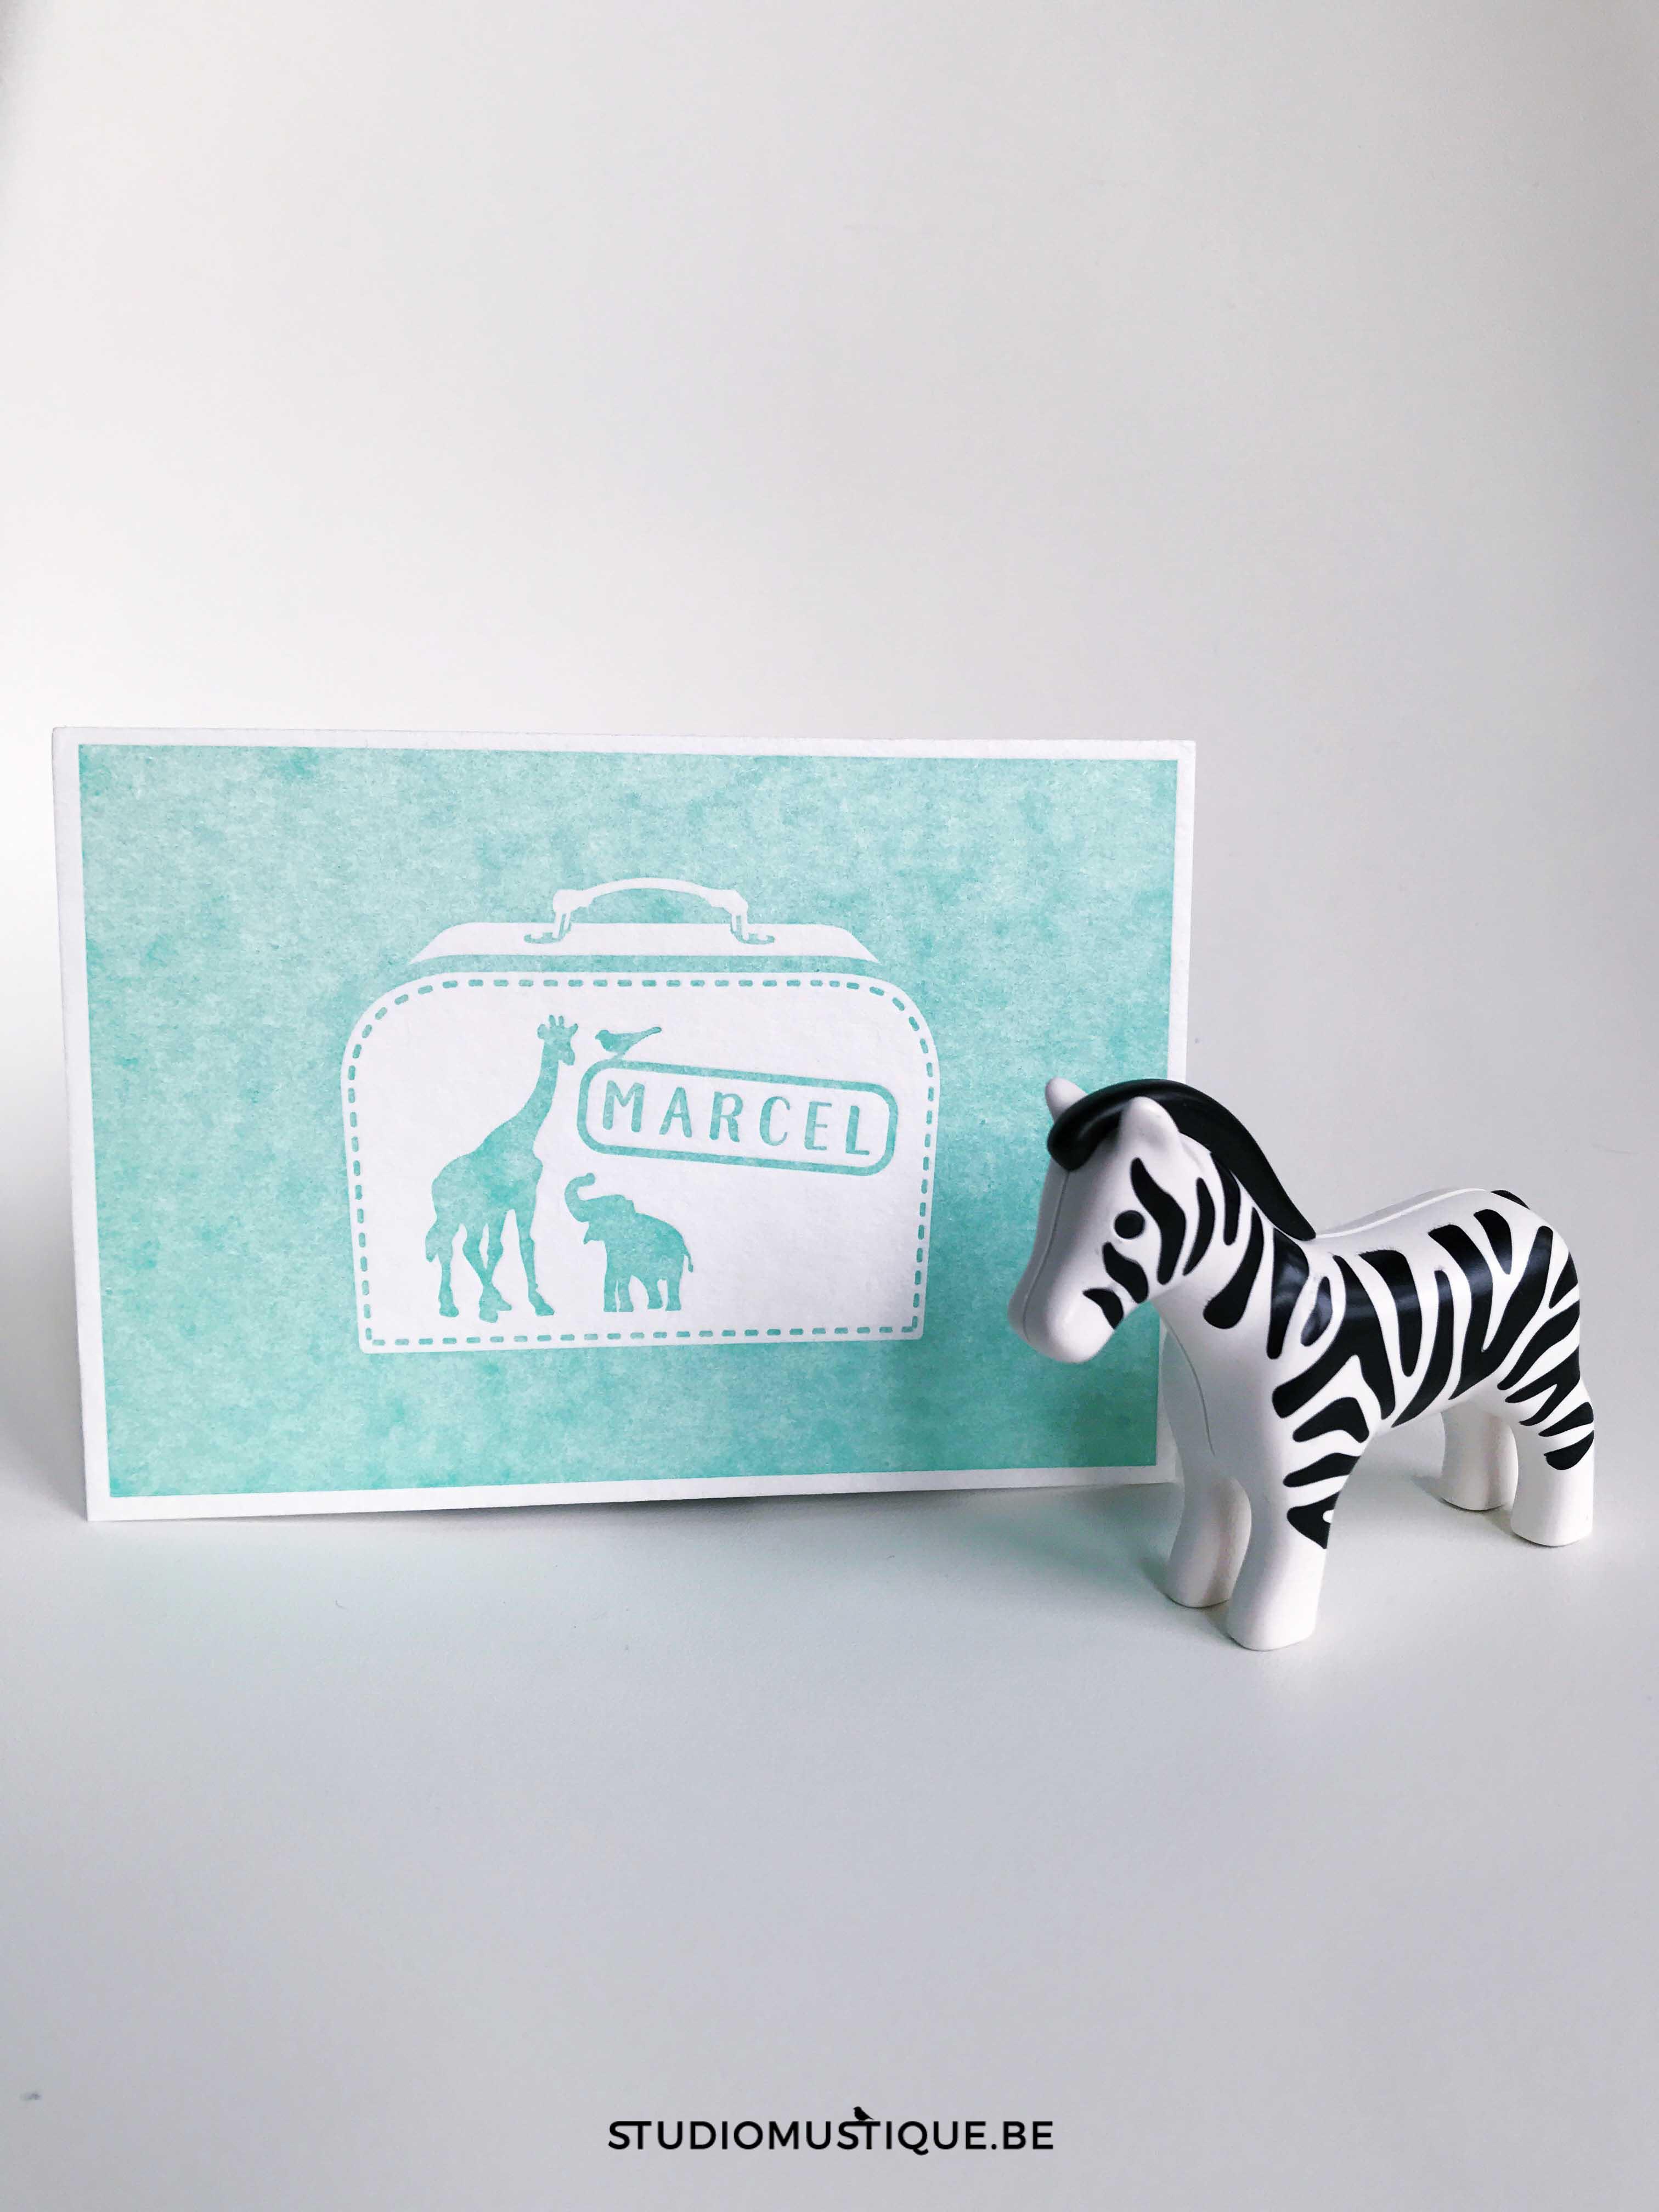 Adoptiekaartje Marcel koffertje adoptie olifant giraf zebra valies letterpress munt